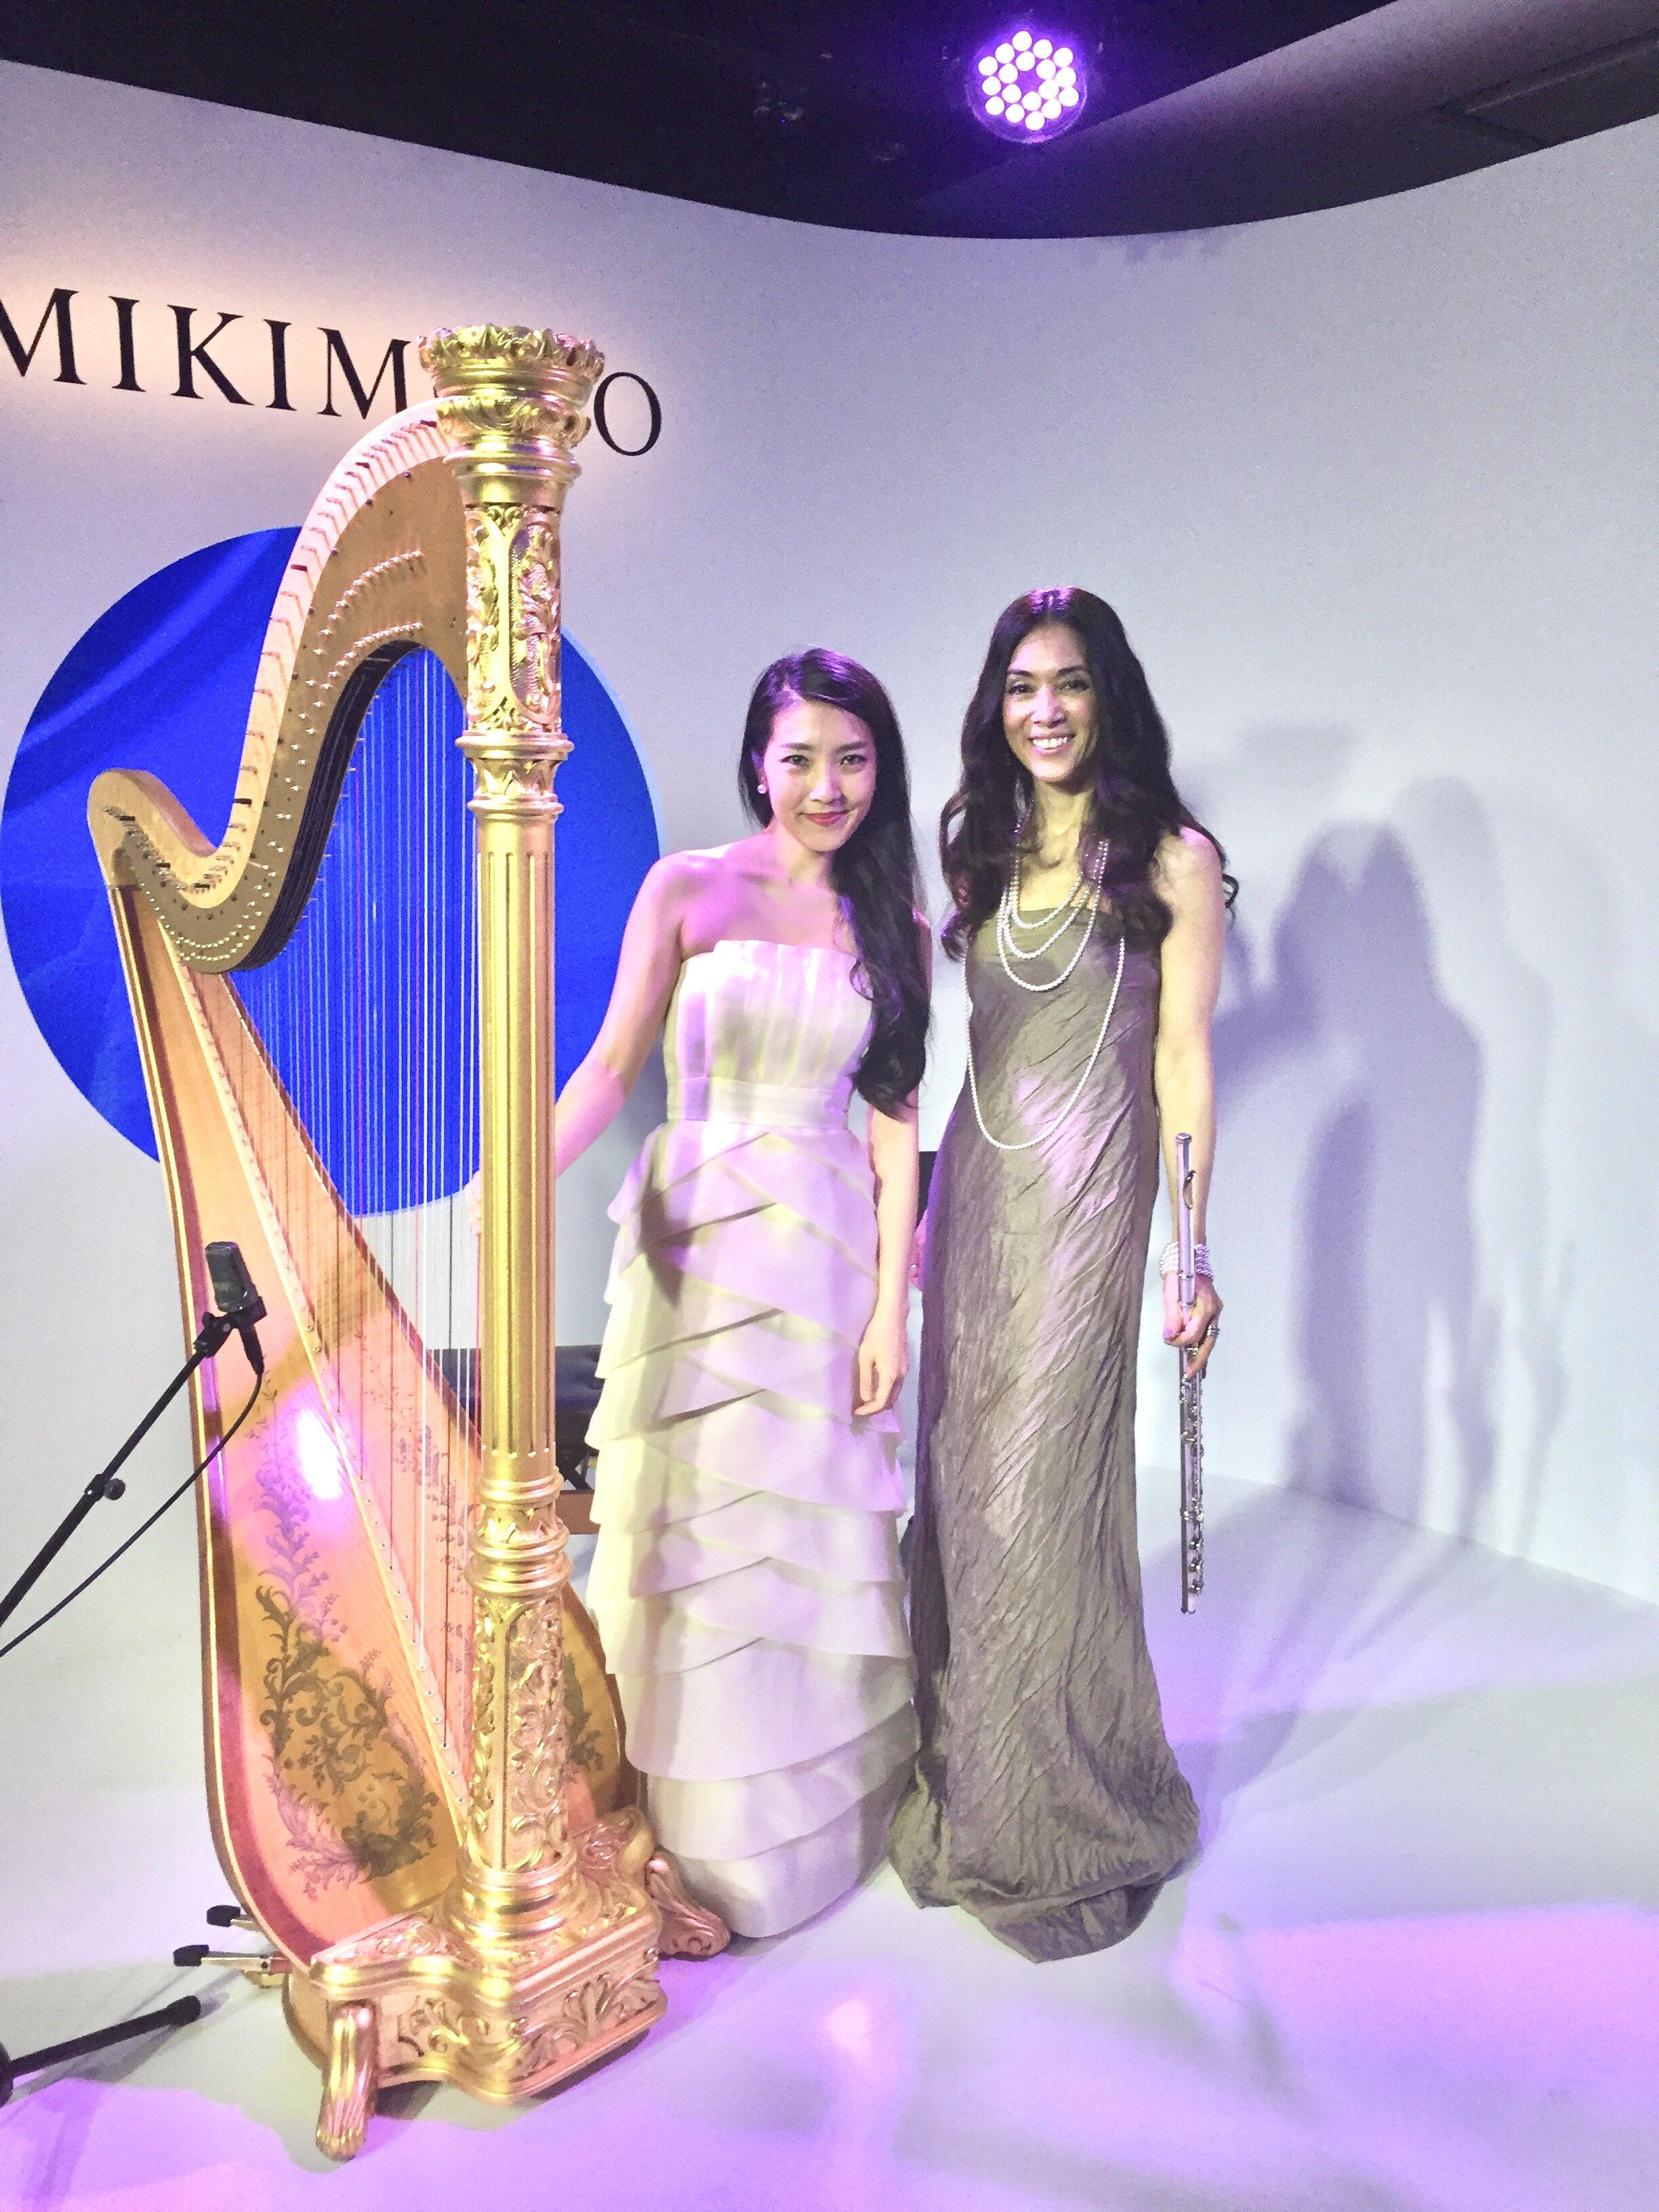 MIKIMOTO EVENT with Ailing Sai 2017